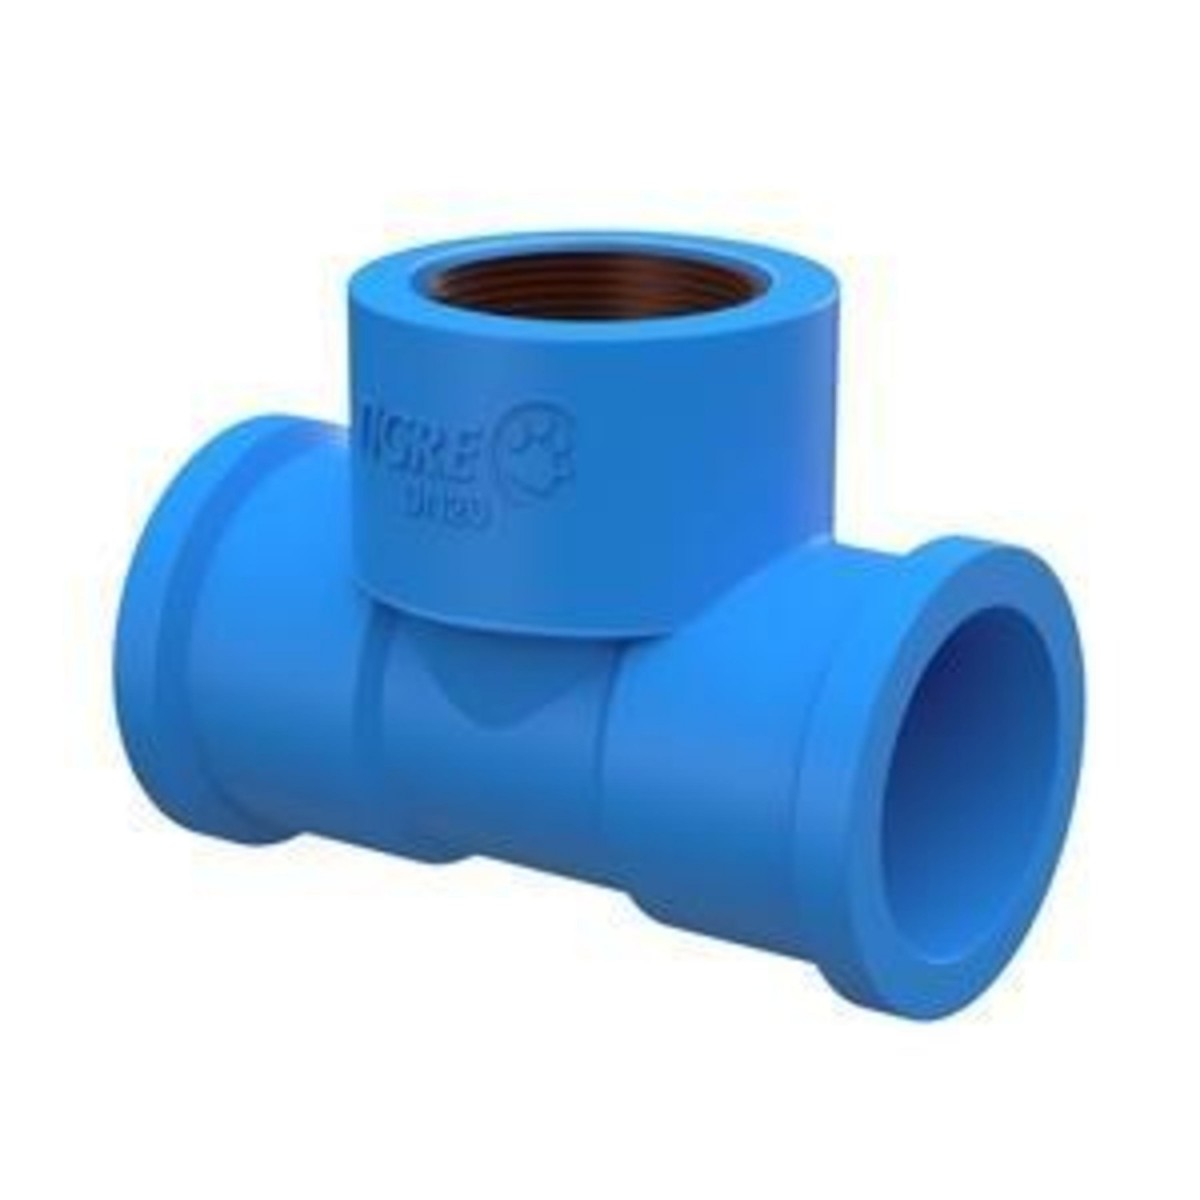 Solda Azul Tê Com Bucha de Latão 25mmx3/4  Tigre